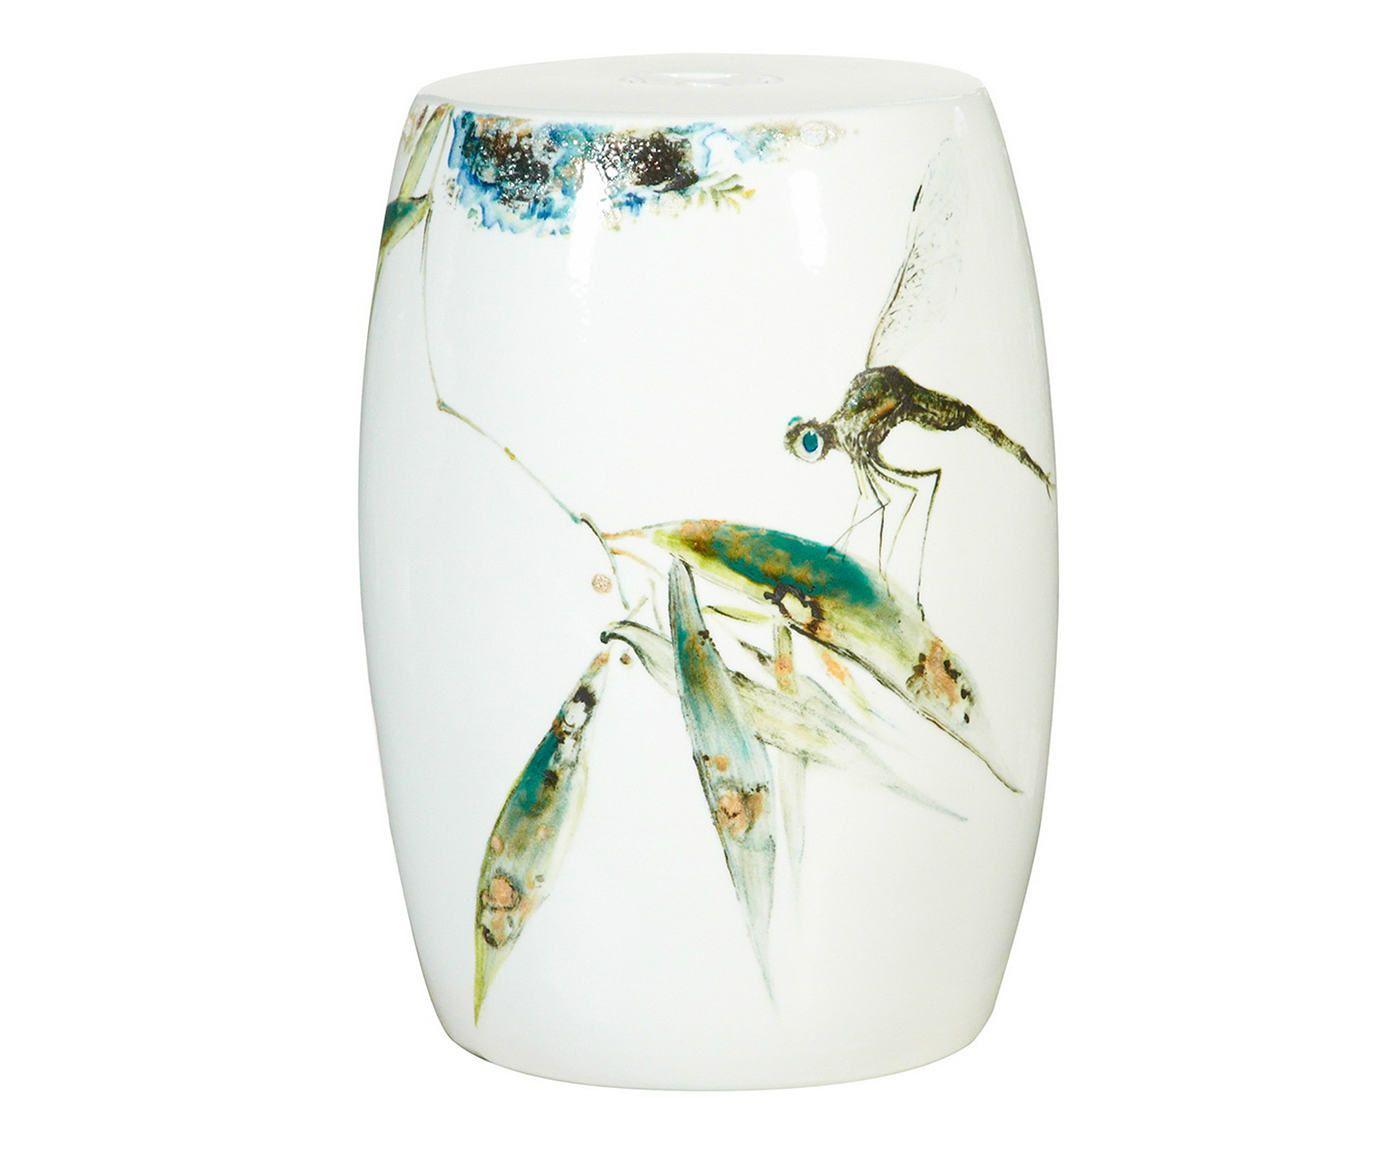 Garden Seat Big Bugs | Westwing.com.br